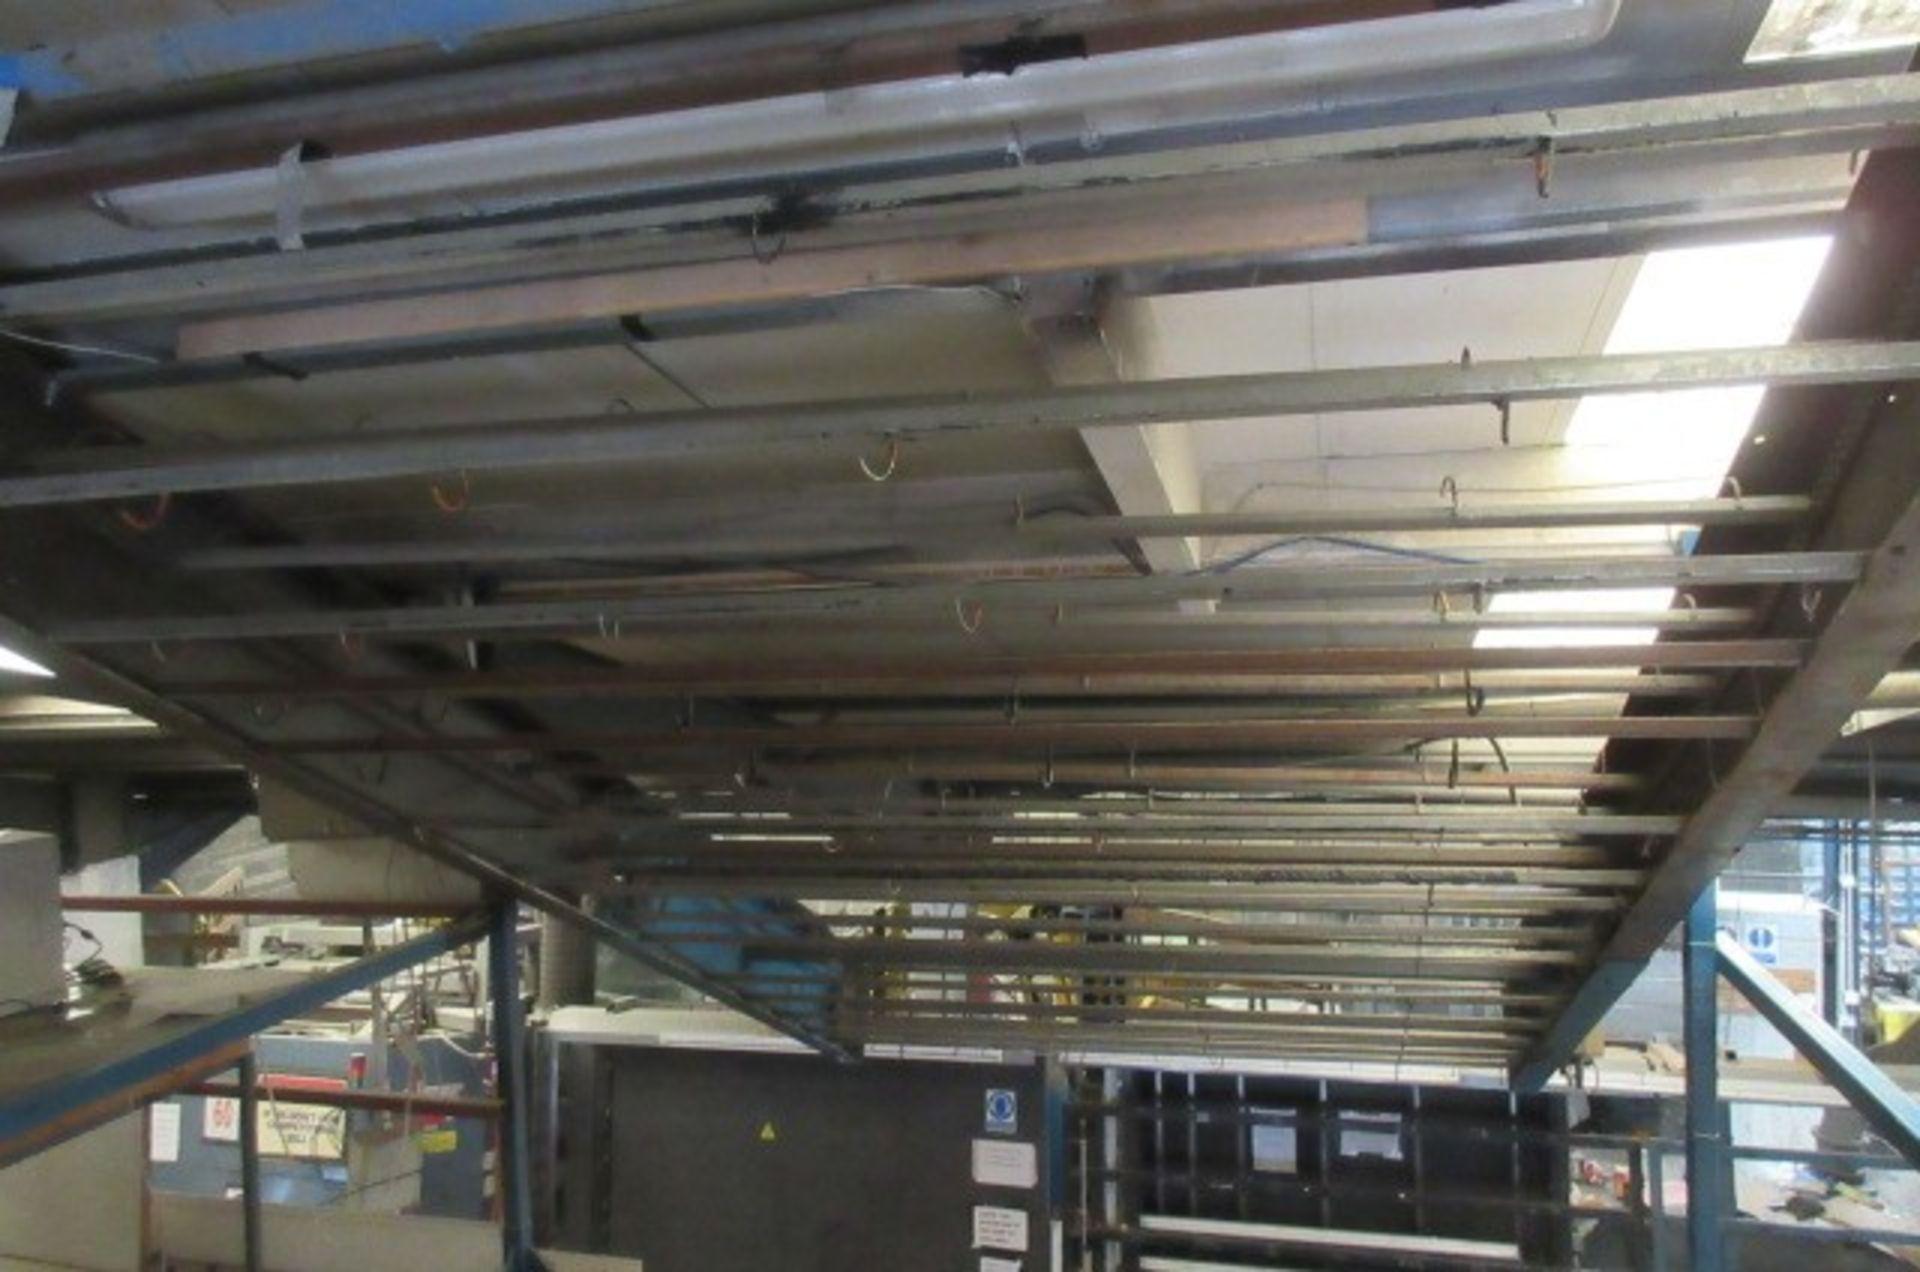 Developments & Products (Leeds) Ltd space frame conveyor - Image 3 of 3